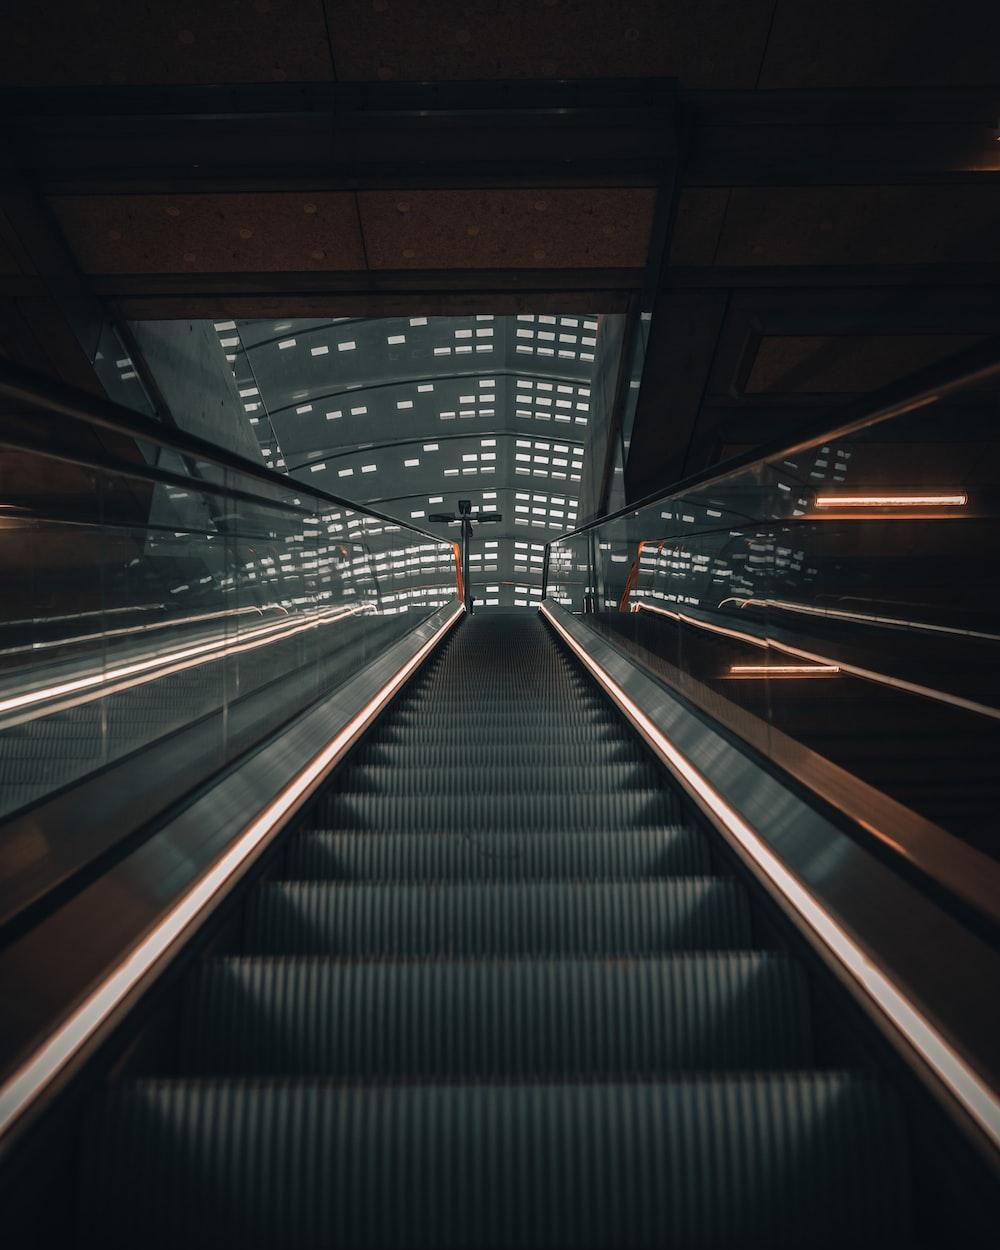 black and gray escalator inside building